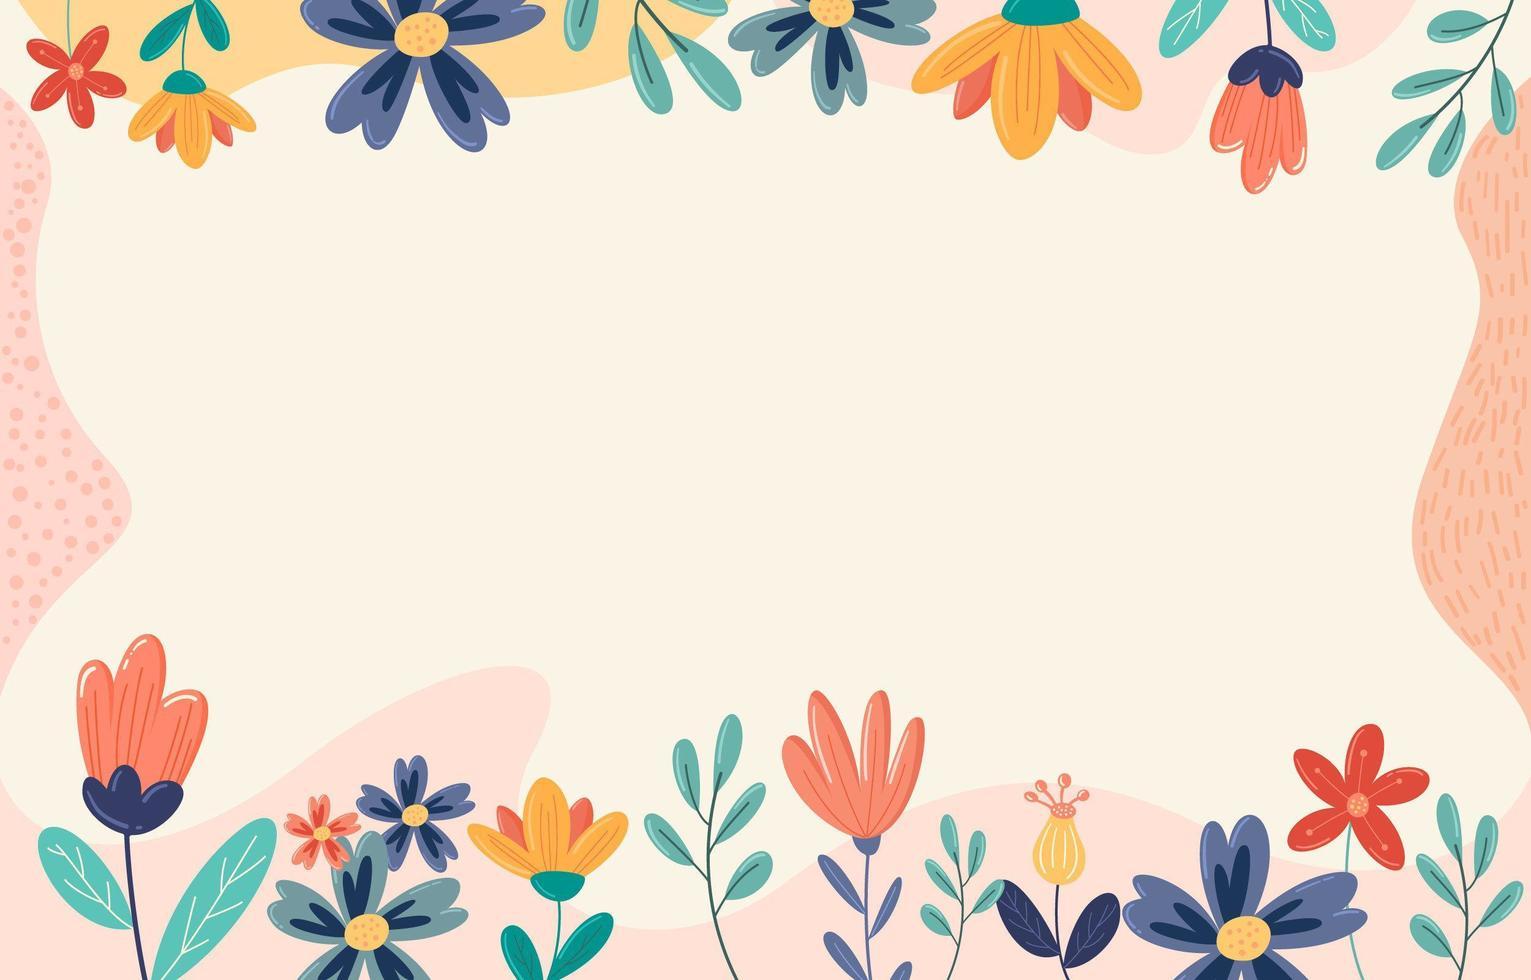 schattige bloemen achtergrond vector